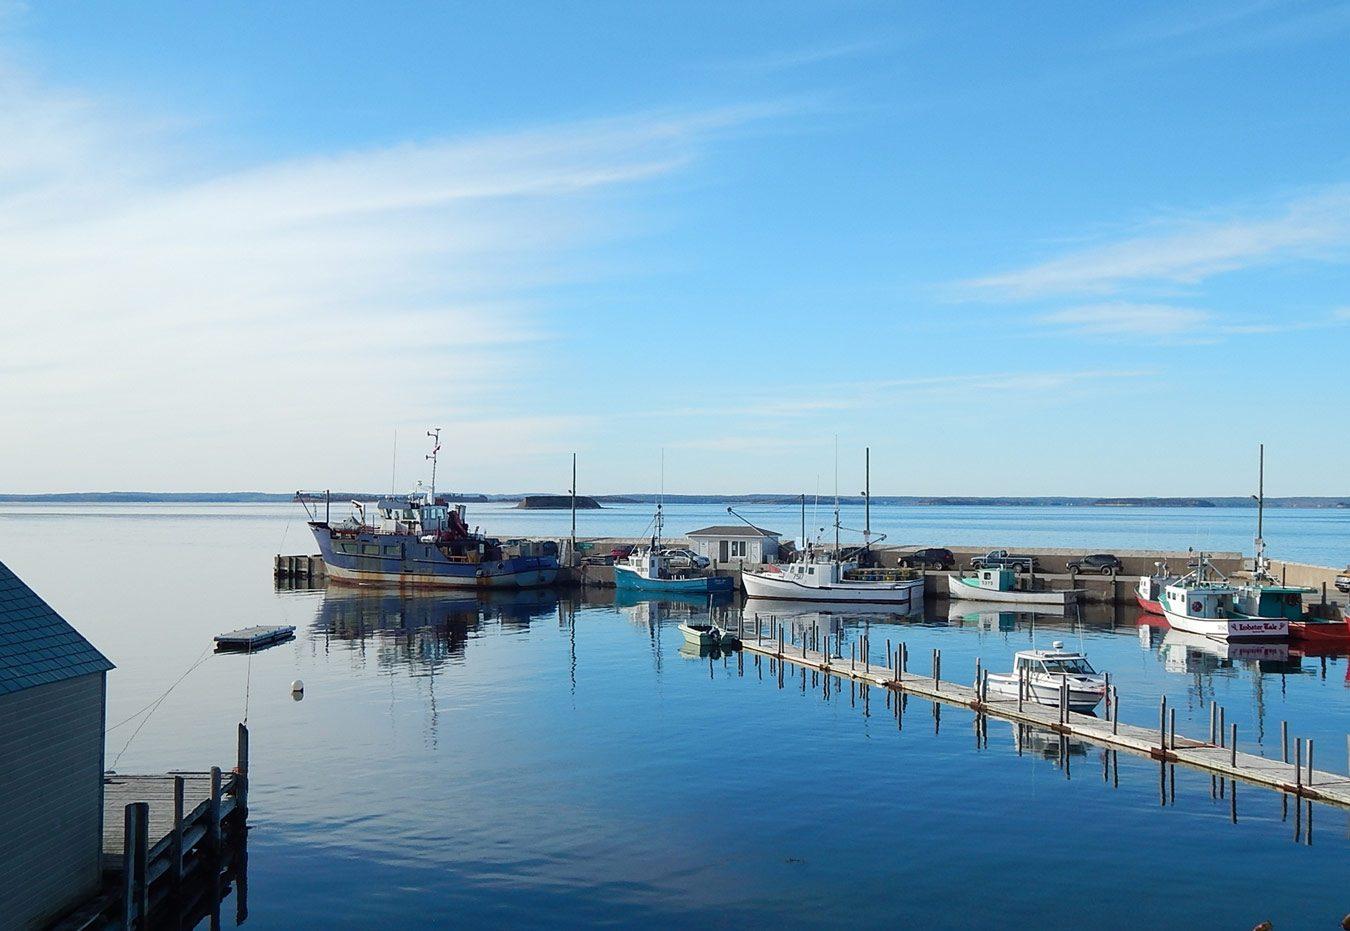 My hometown - Tancook Island, Nova Scotia